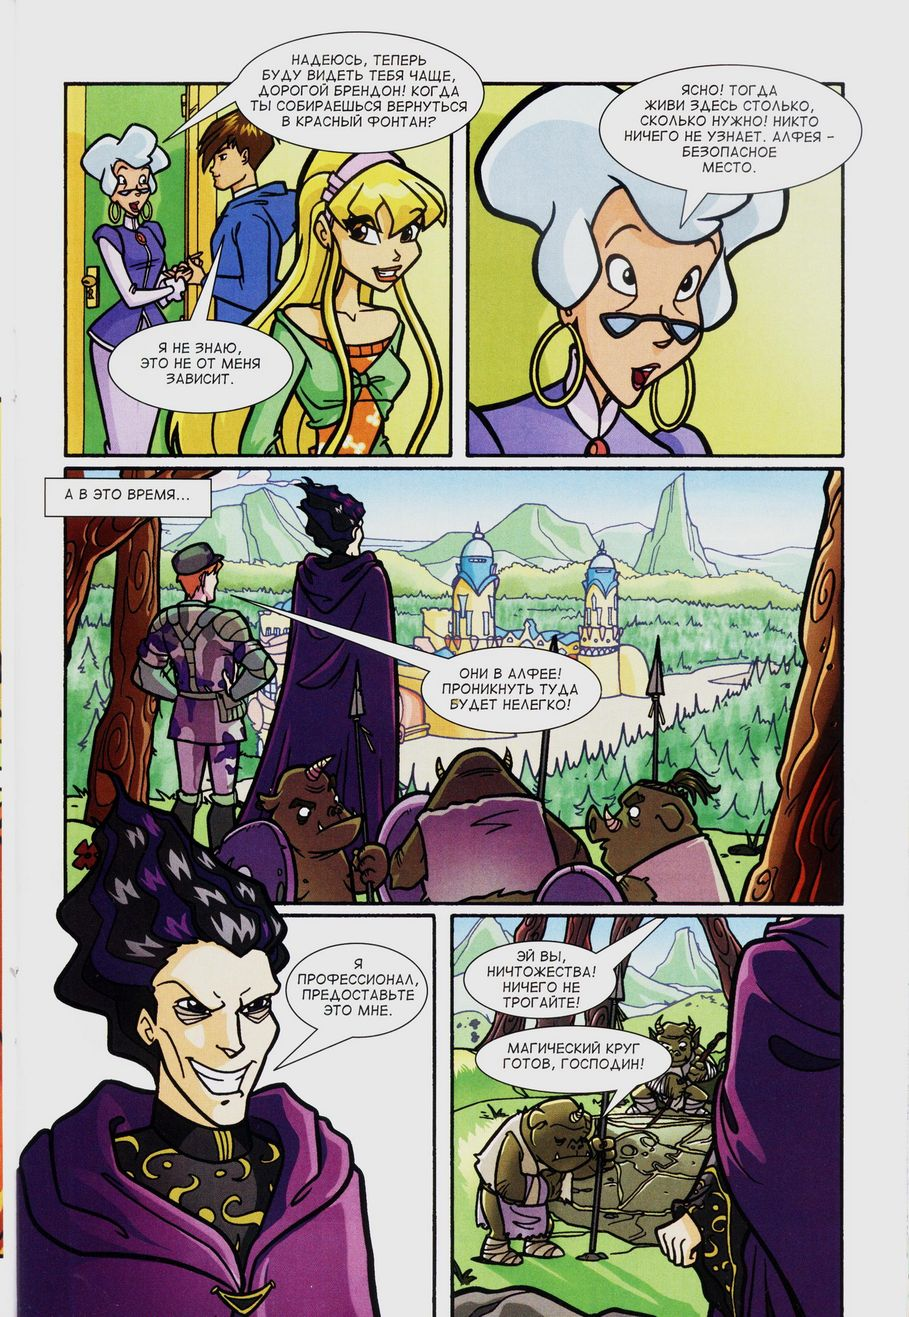 Комикс Винкс Winx - Волшебник Камуд (Журнал Винкс №6 2011) - стр. 31